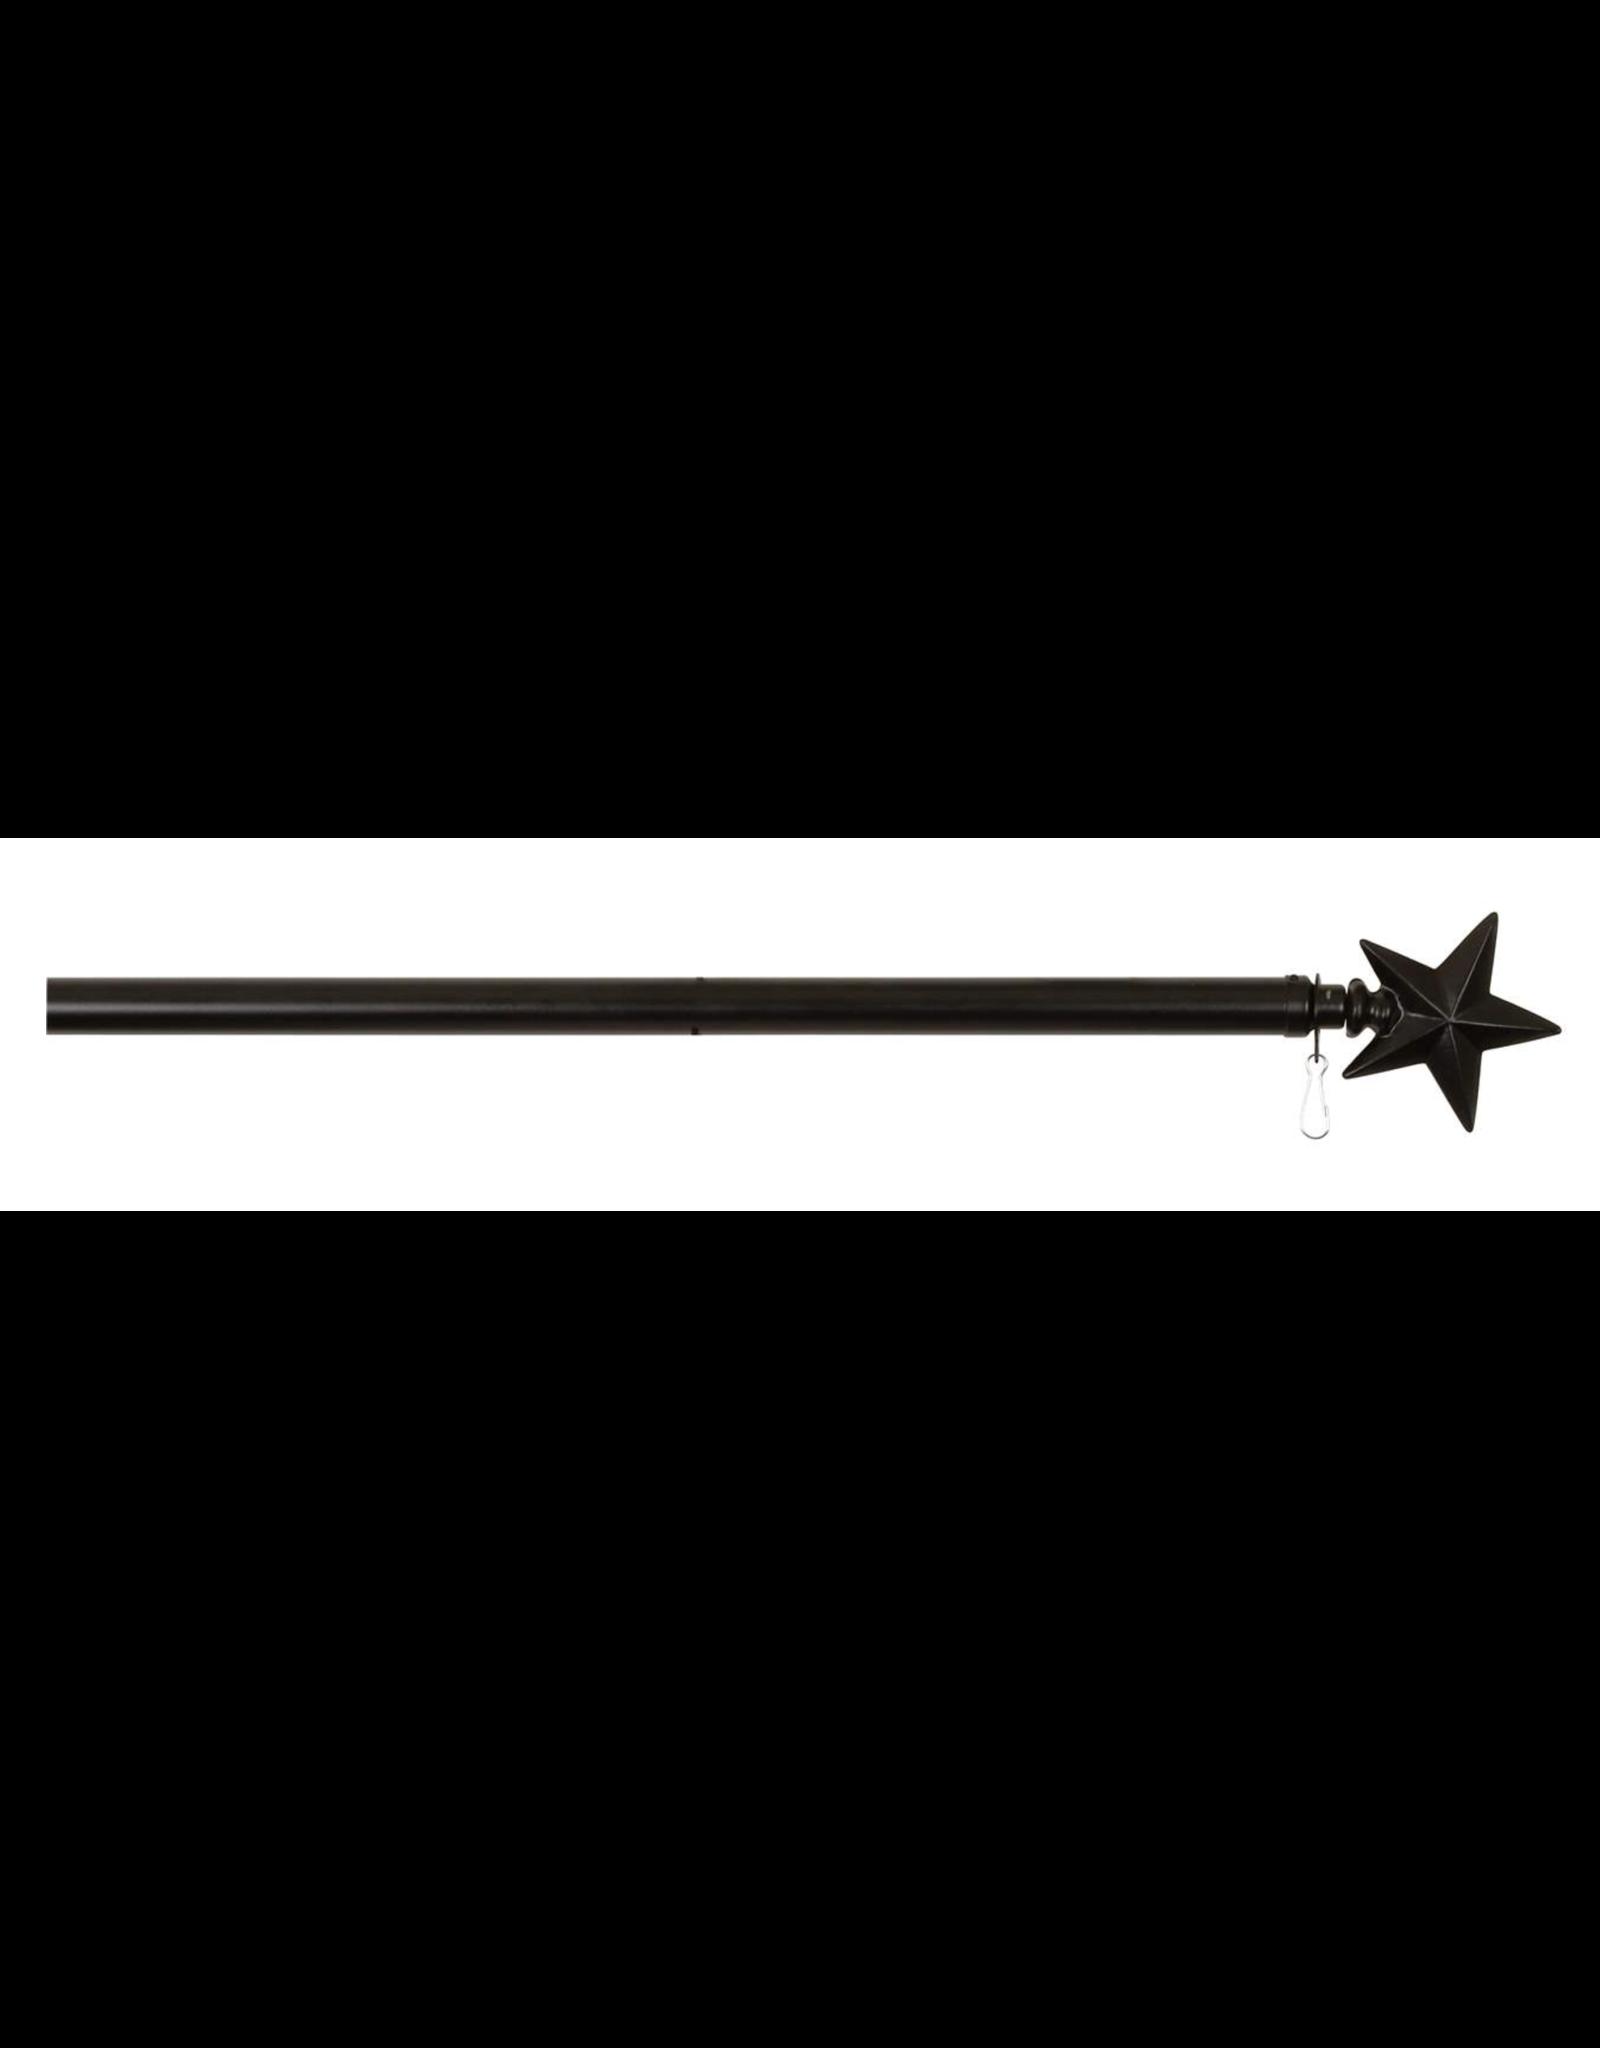 "Edenborough EL60755 60"" Black Star Flag pole"